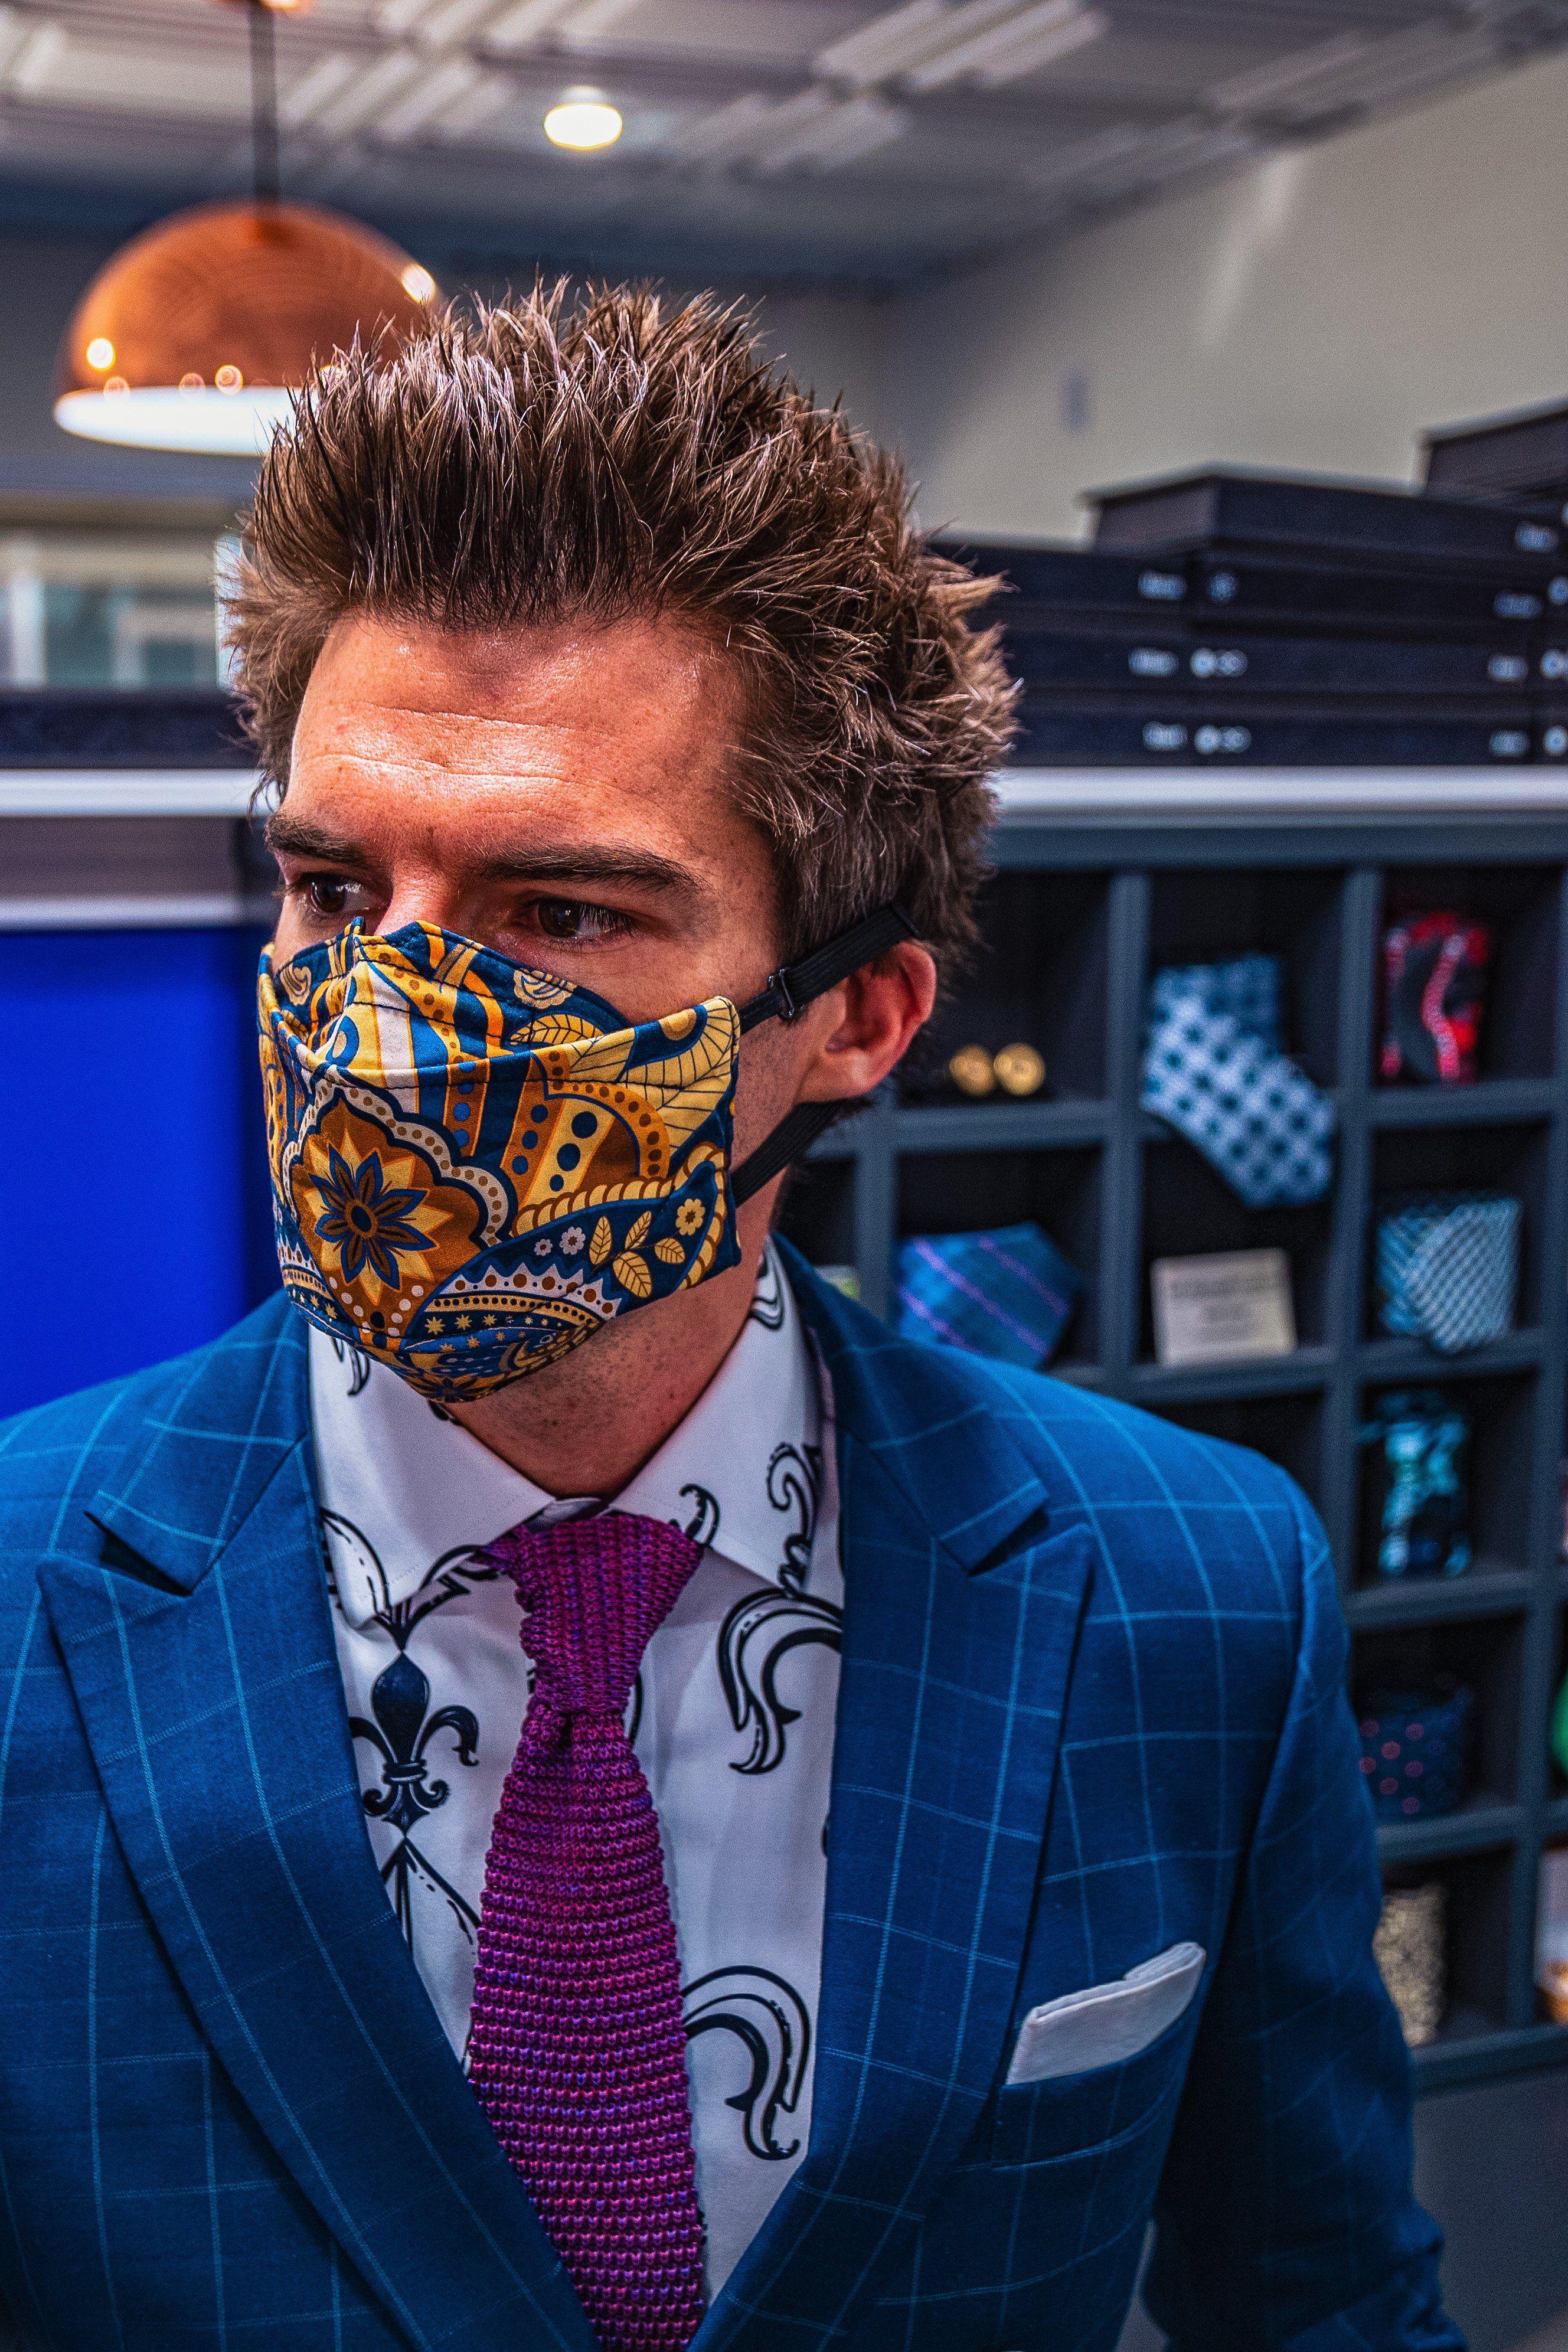 Dangerous face protection premium jeff alpaugh custom